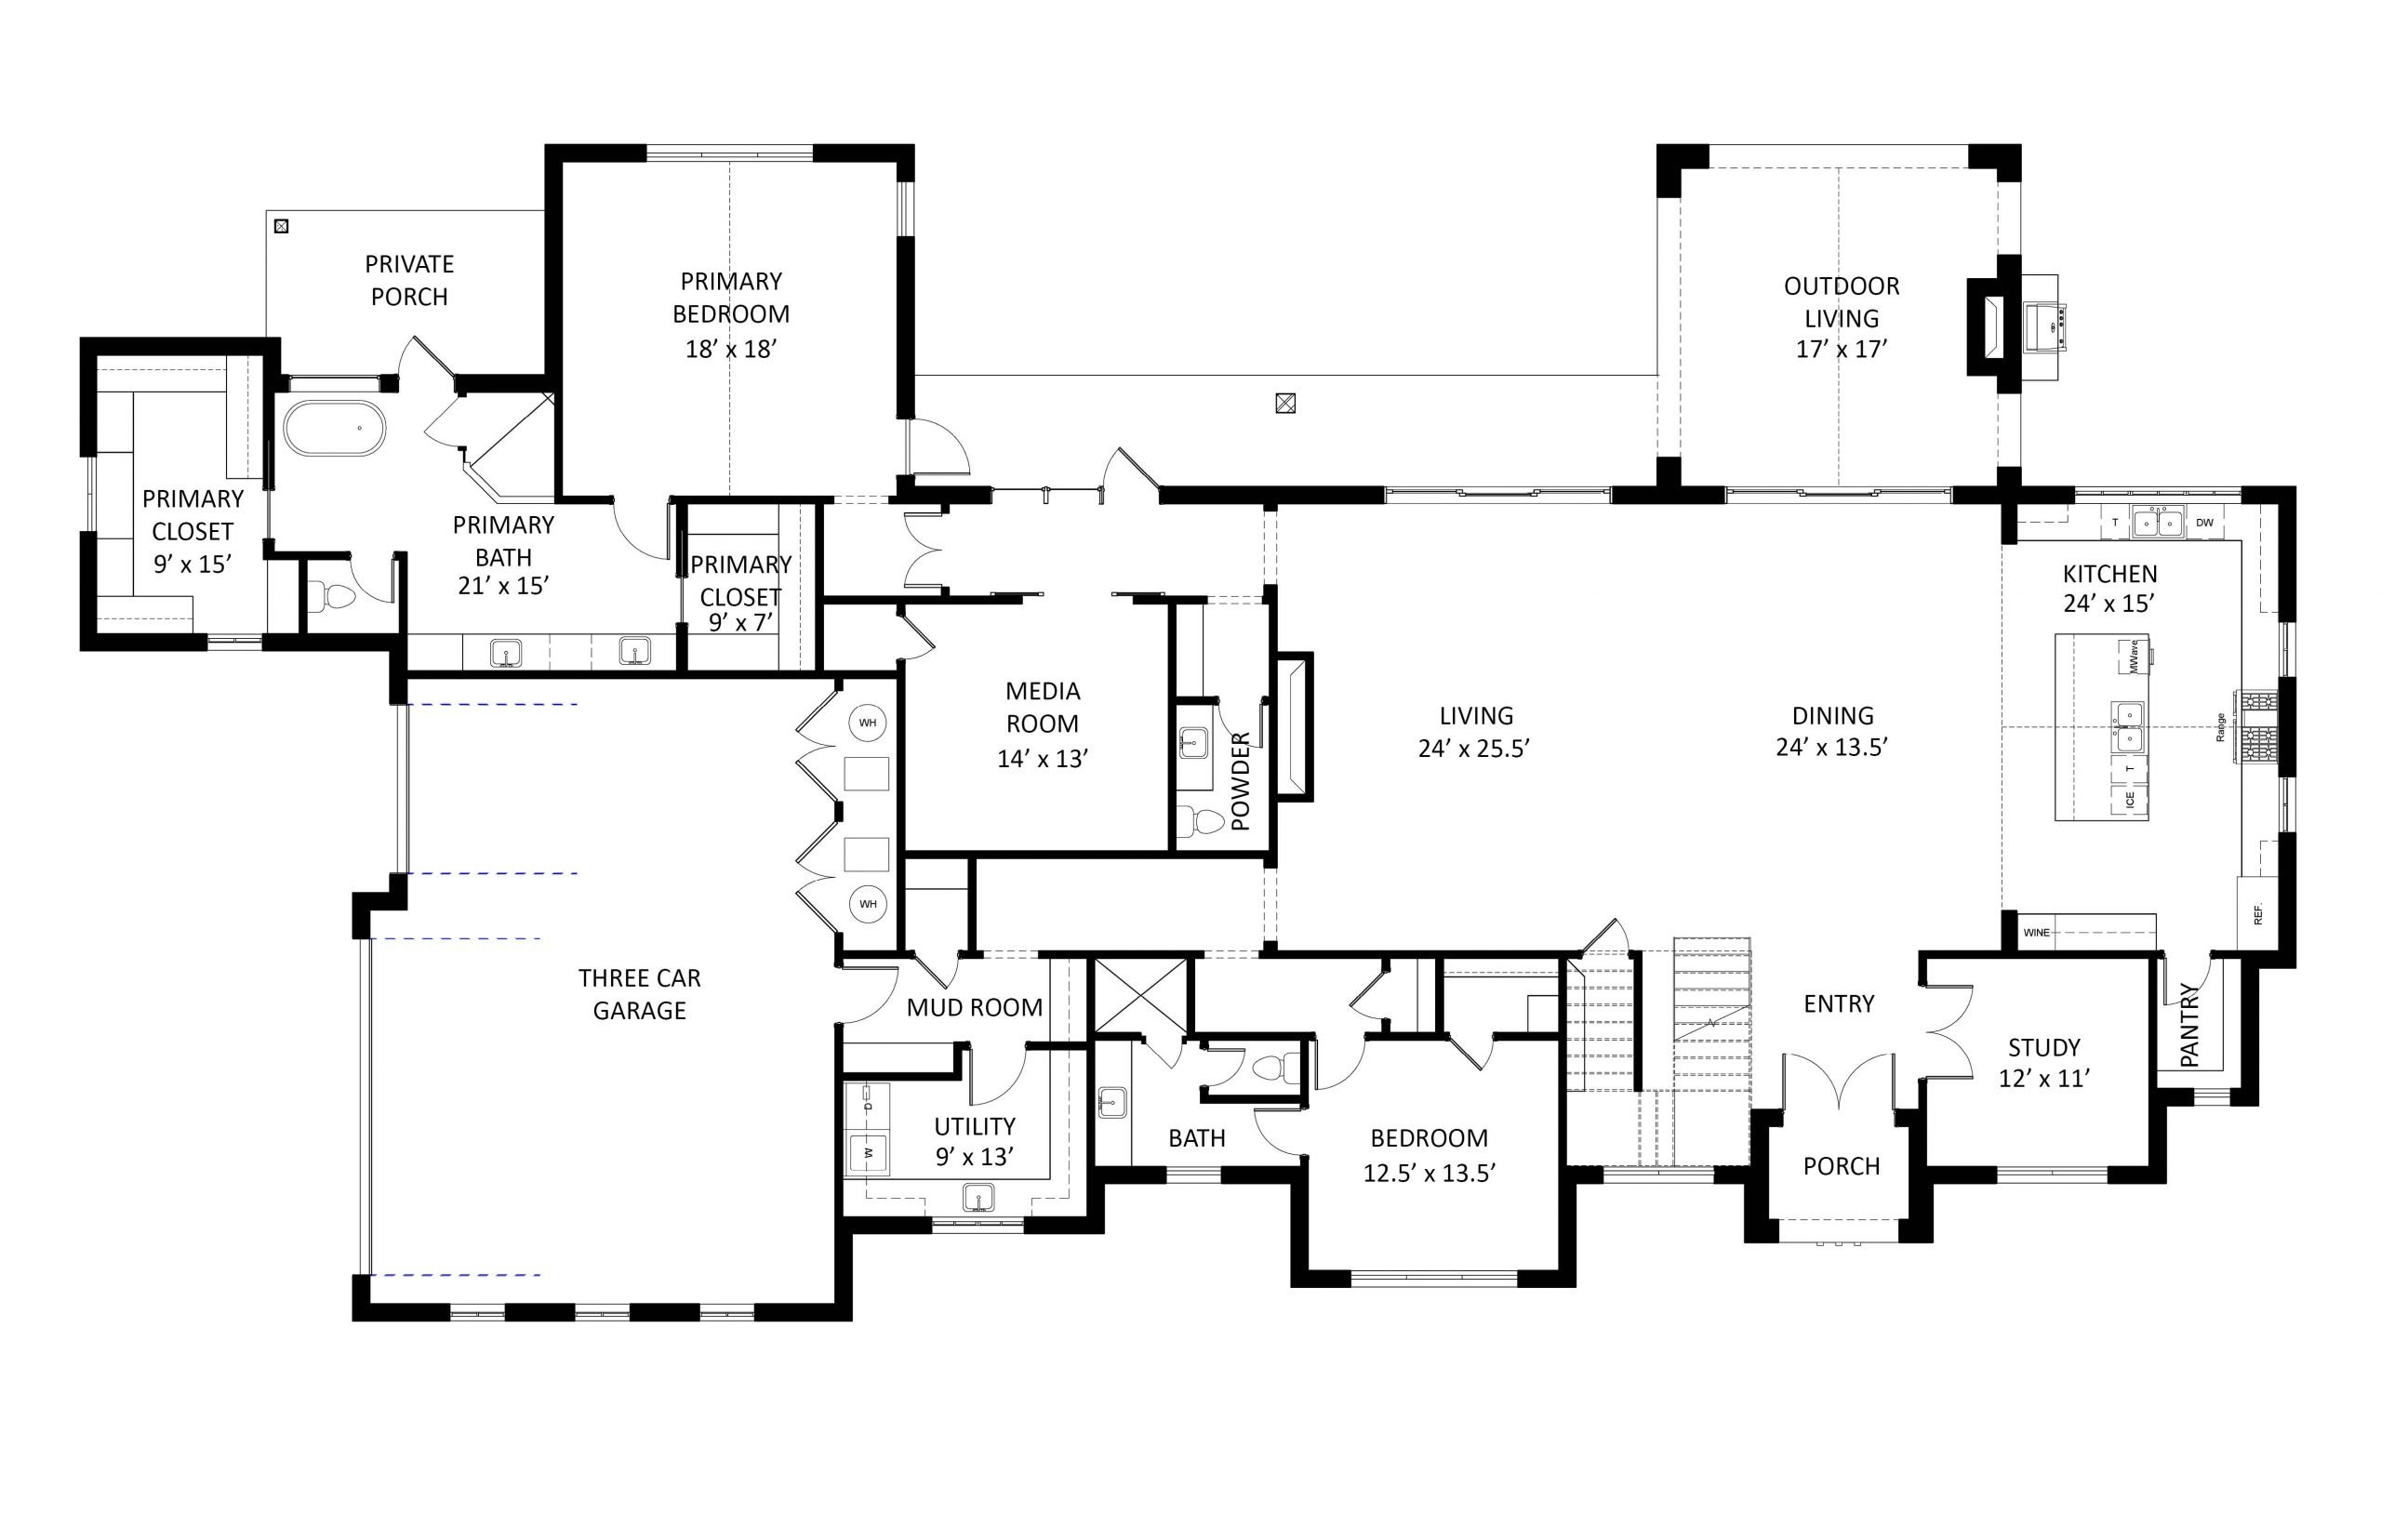 9617 Lakeway Run Floor Plans